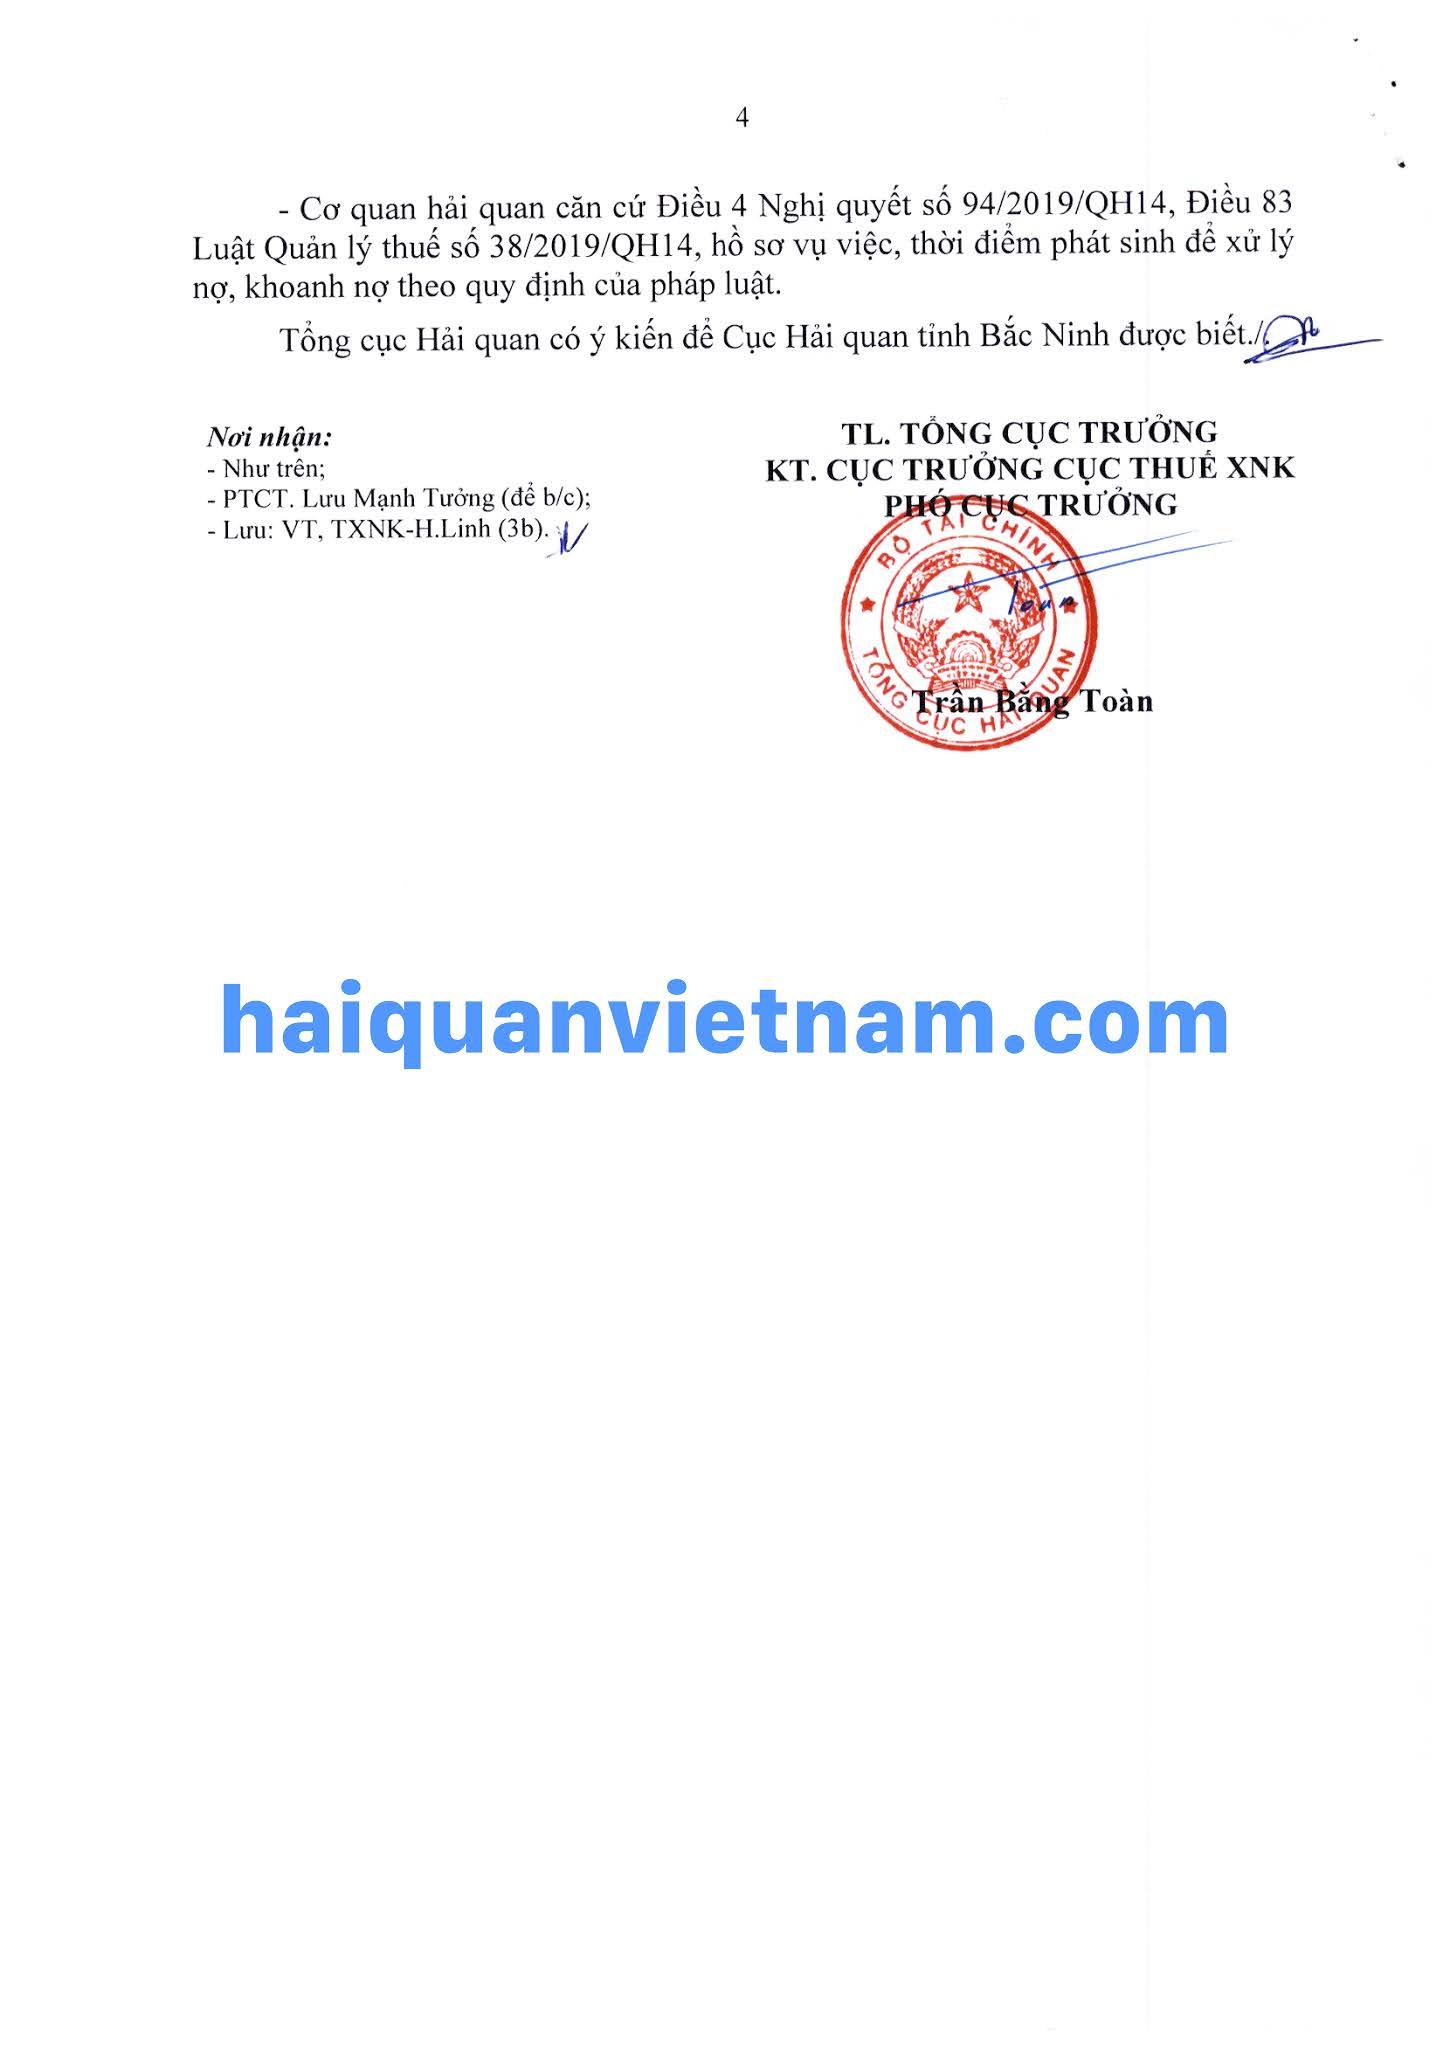 [Image: 210709-3460-TCHQ-TXNK_haiquanvietnam_04.jpg]